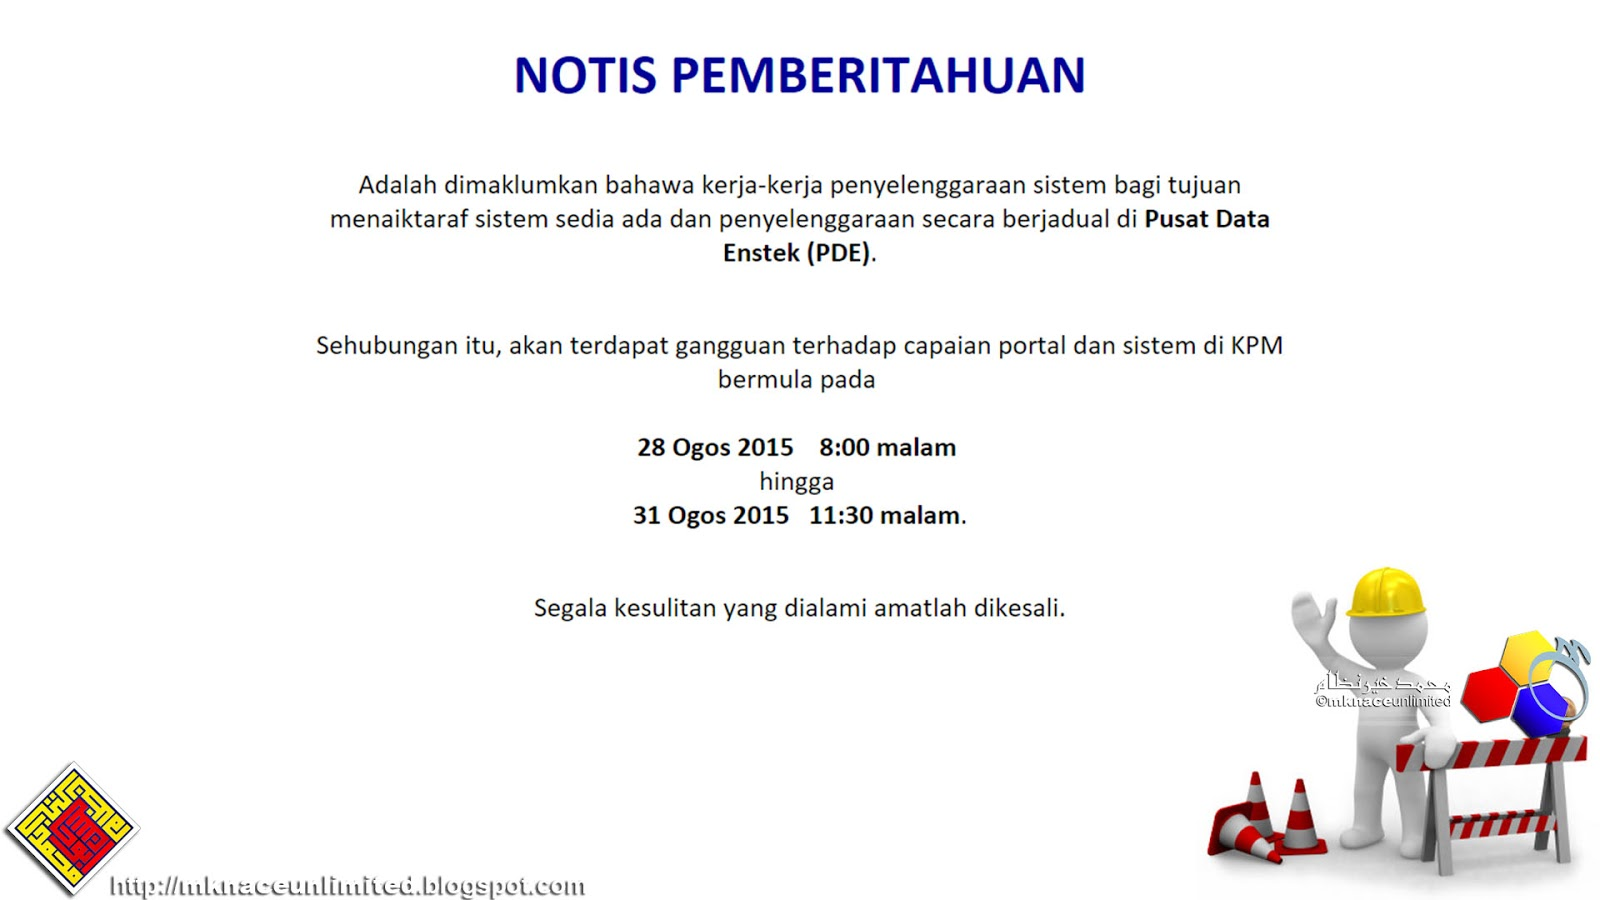 Kerja Penyelenggaraan Sistem Bagi Kementerian Pendidikan